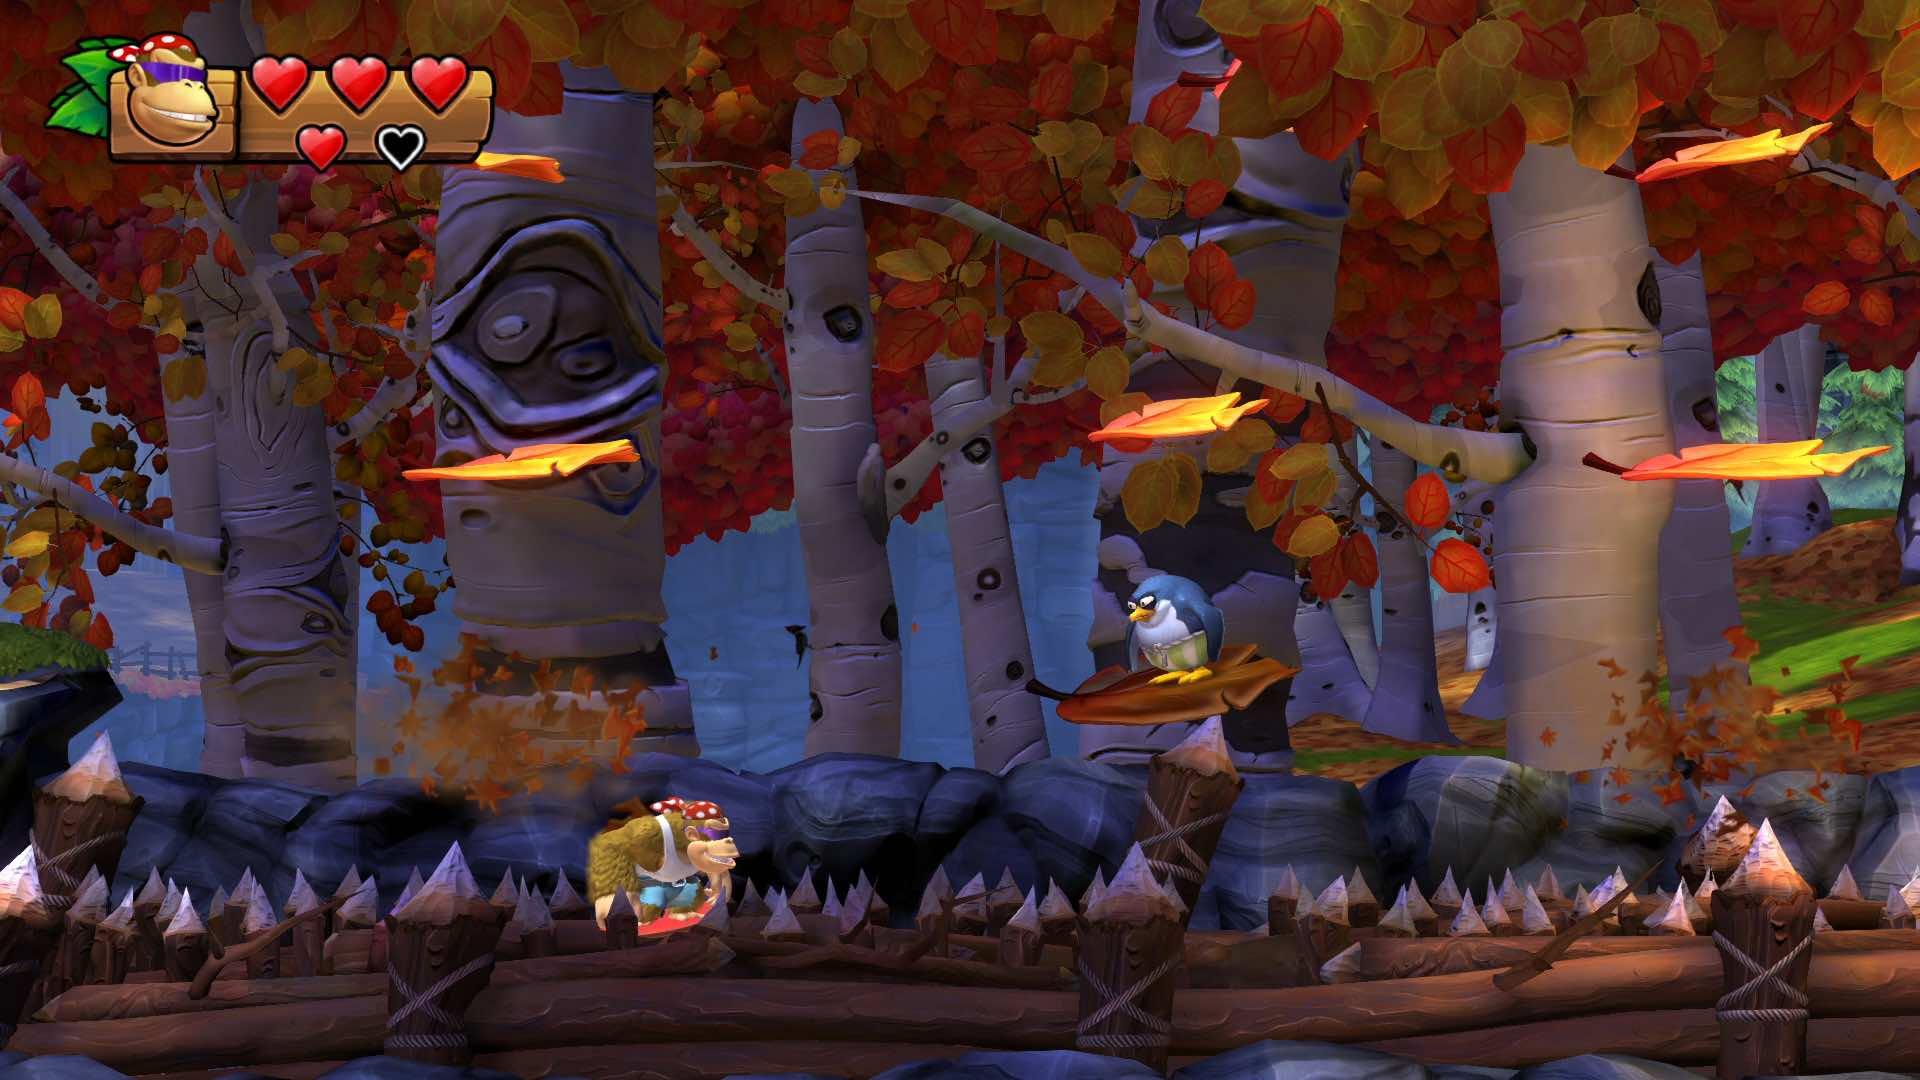 donkey-kong-country-tropical-freeze-switch-screenshot-6